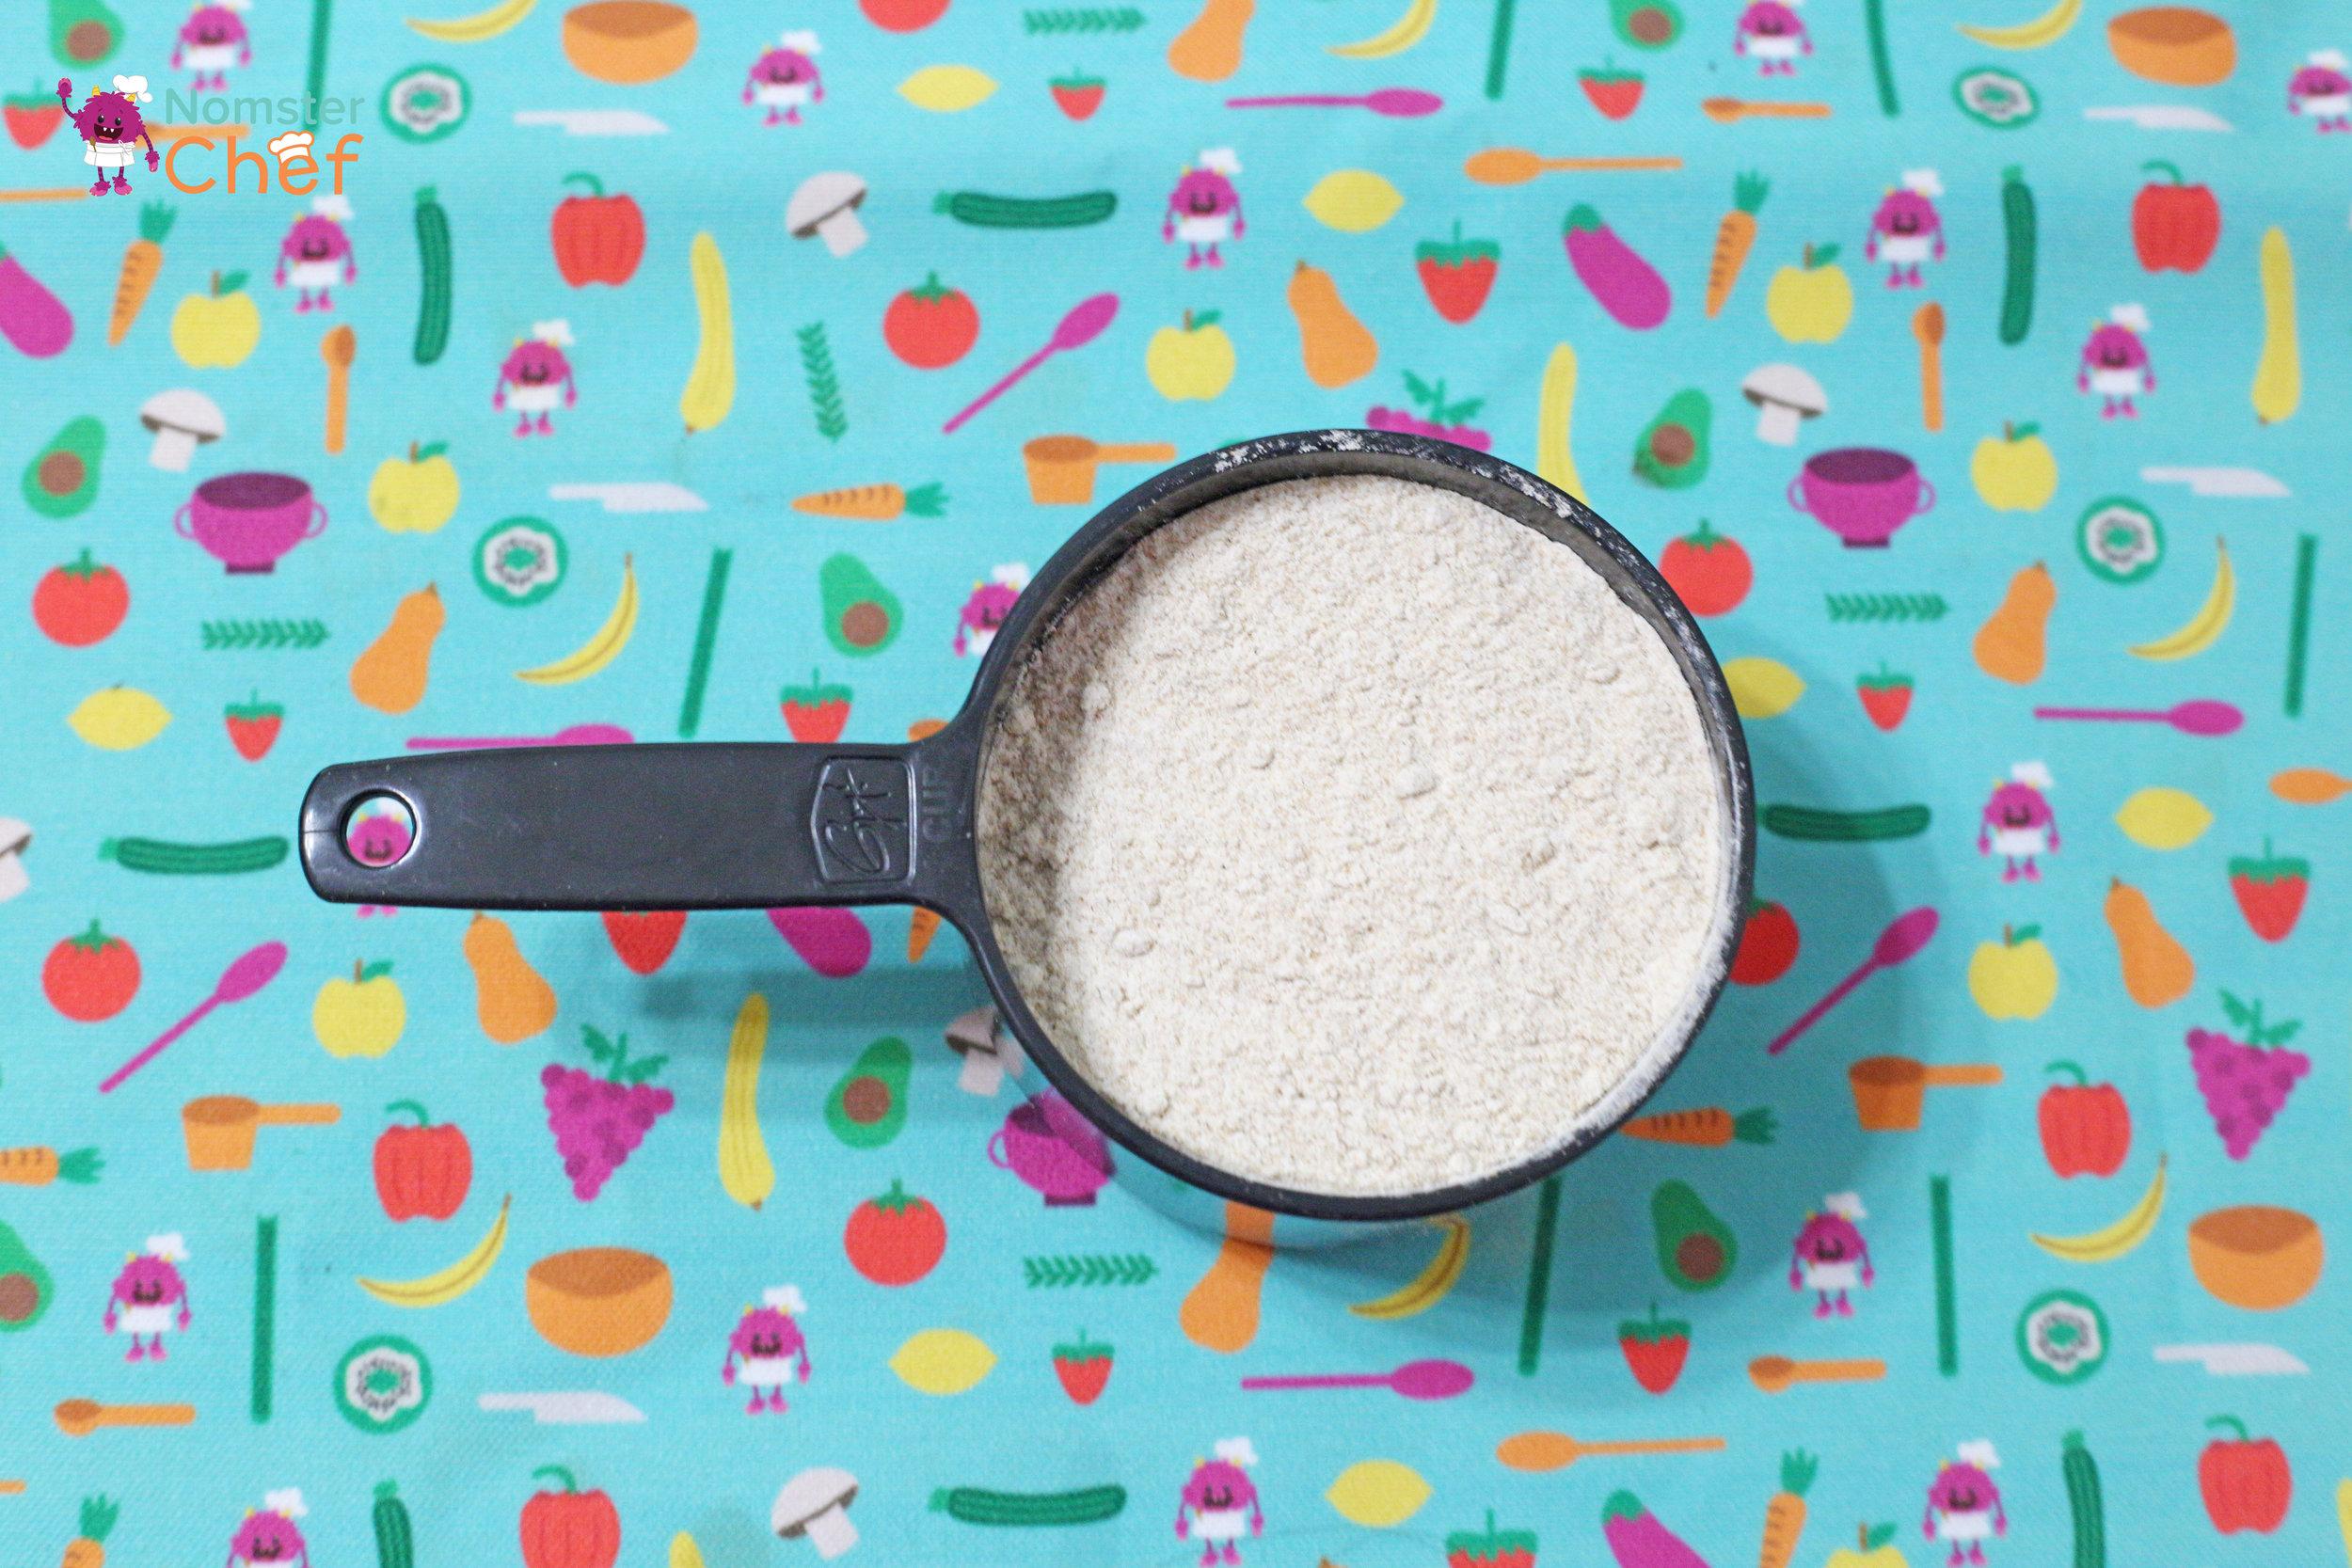 Kitchen_Vocabulary_Vegan_Pancakes_049 copy.jpg